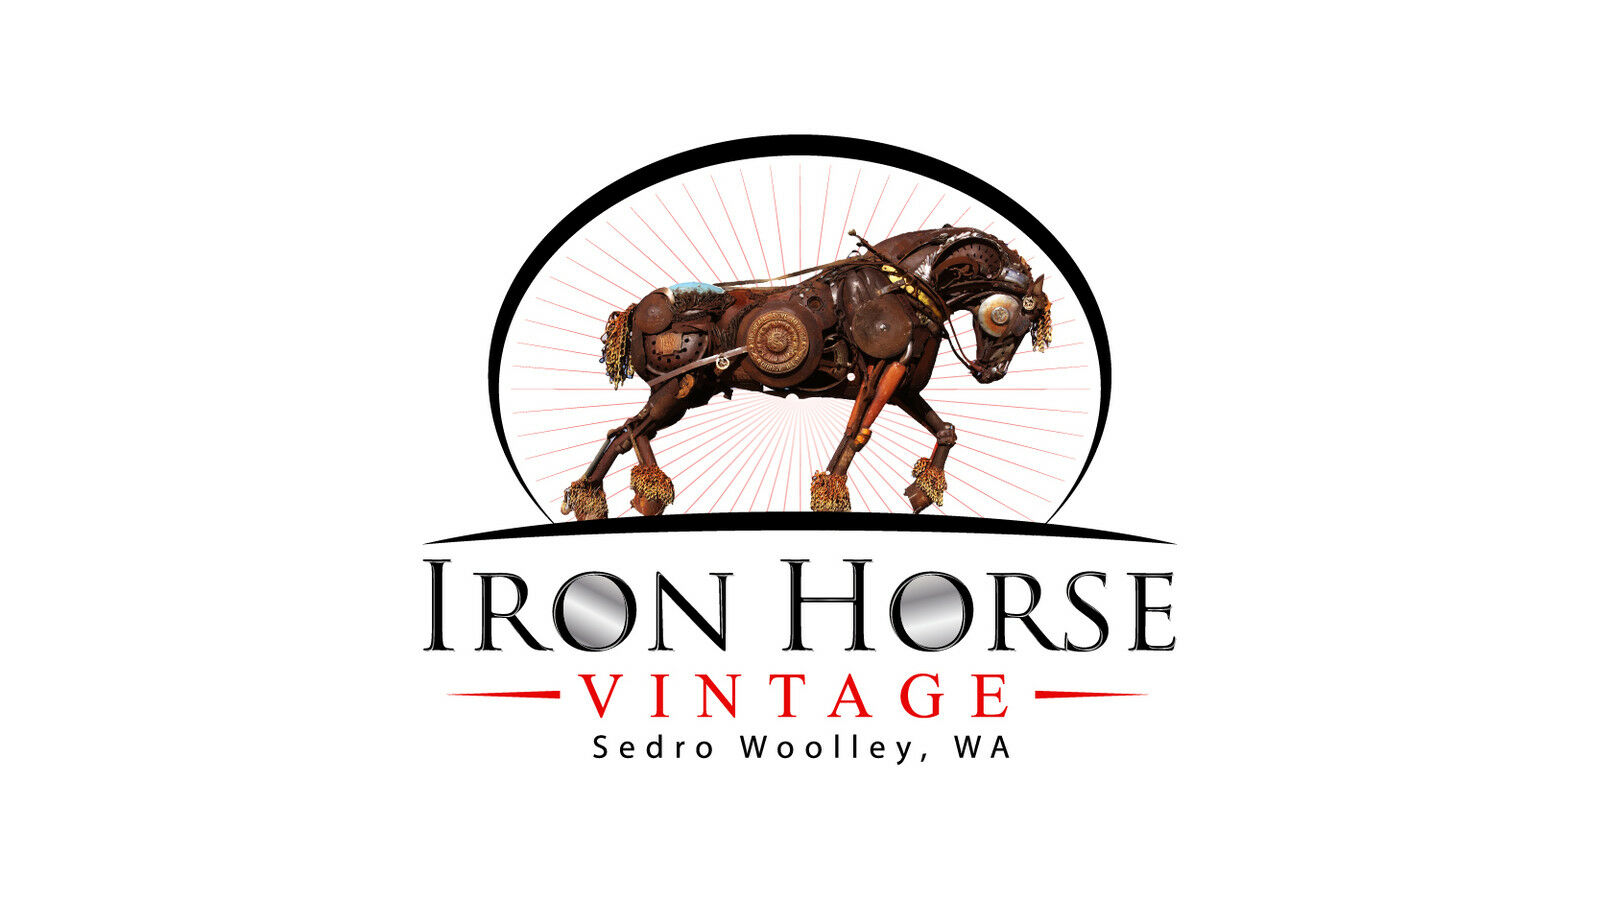 Iron Horse Vintage